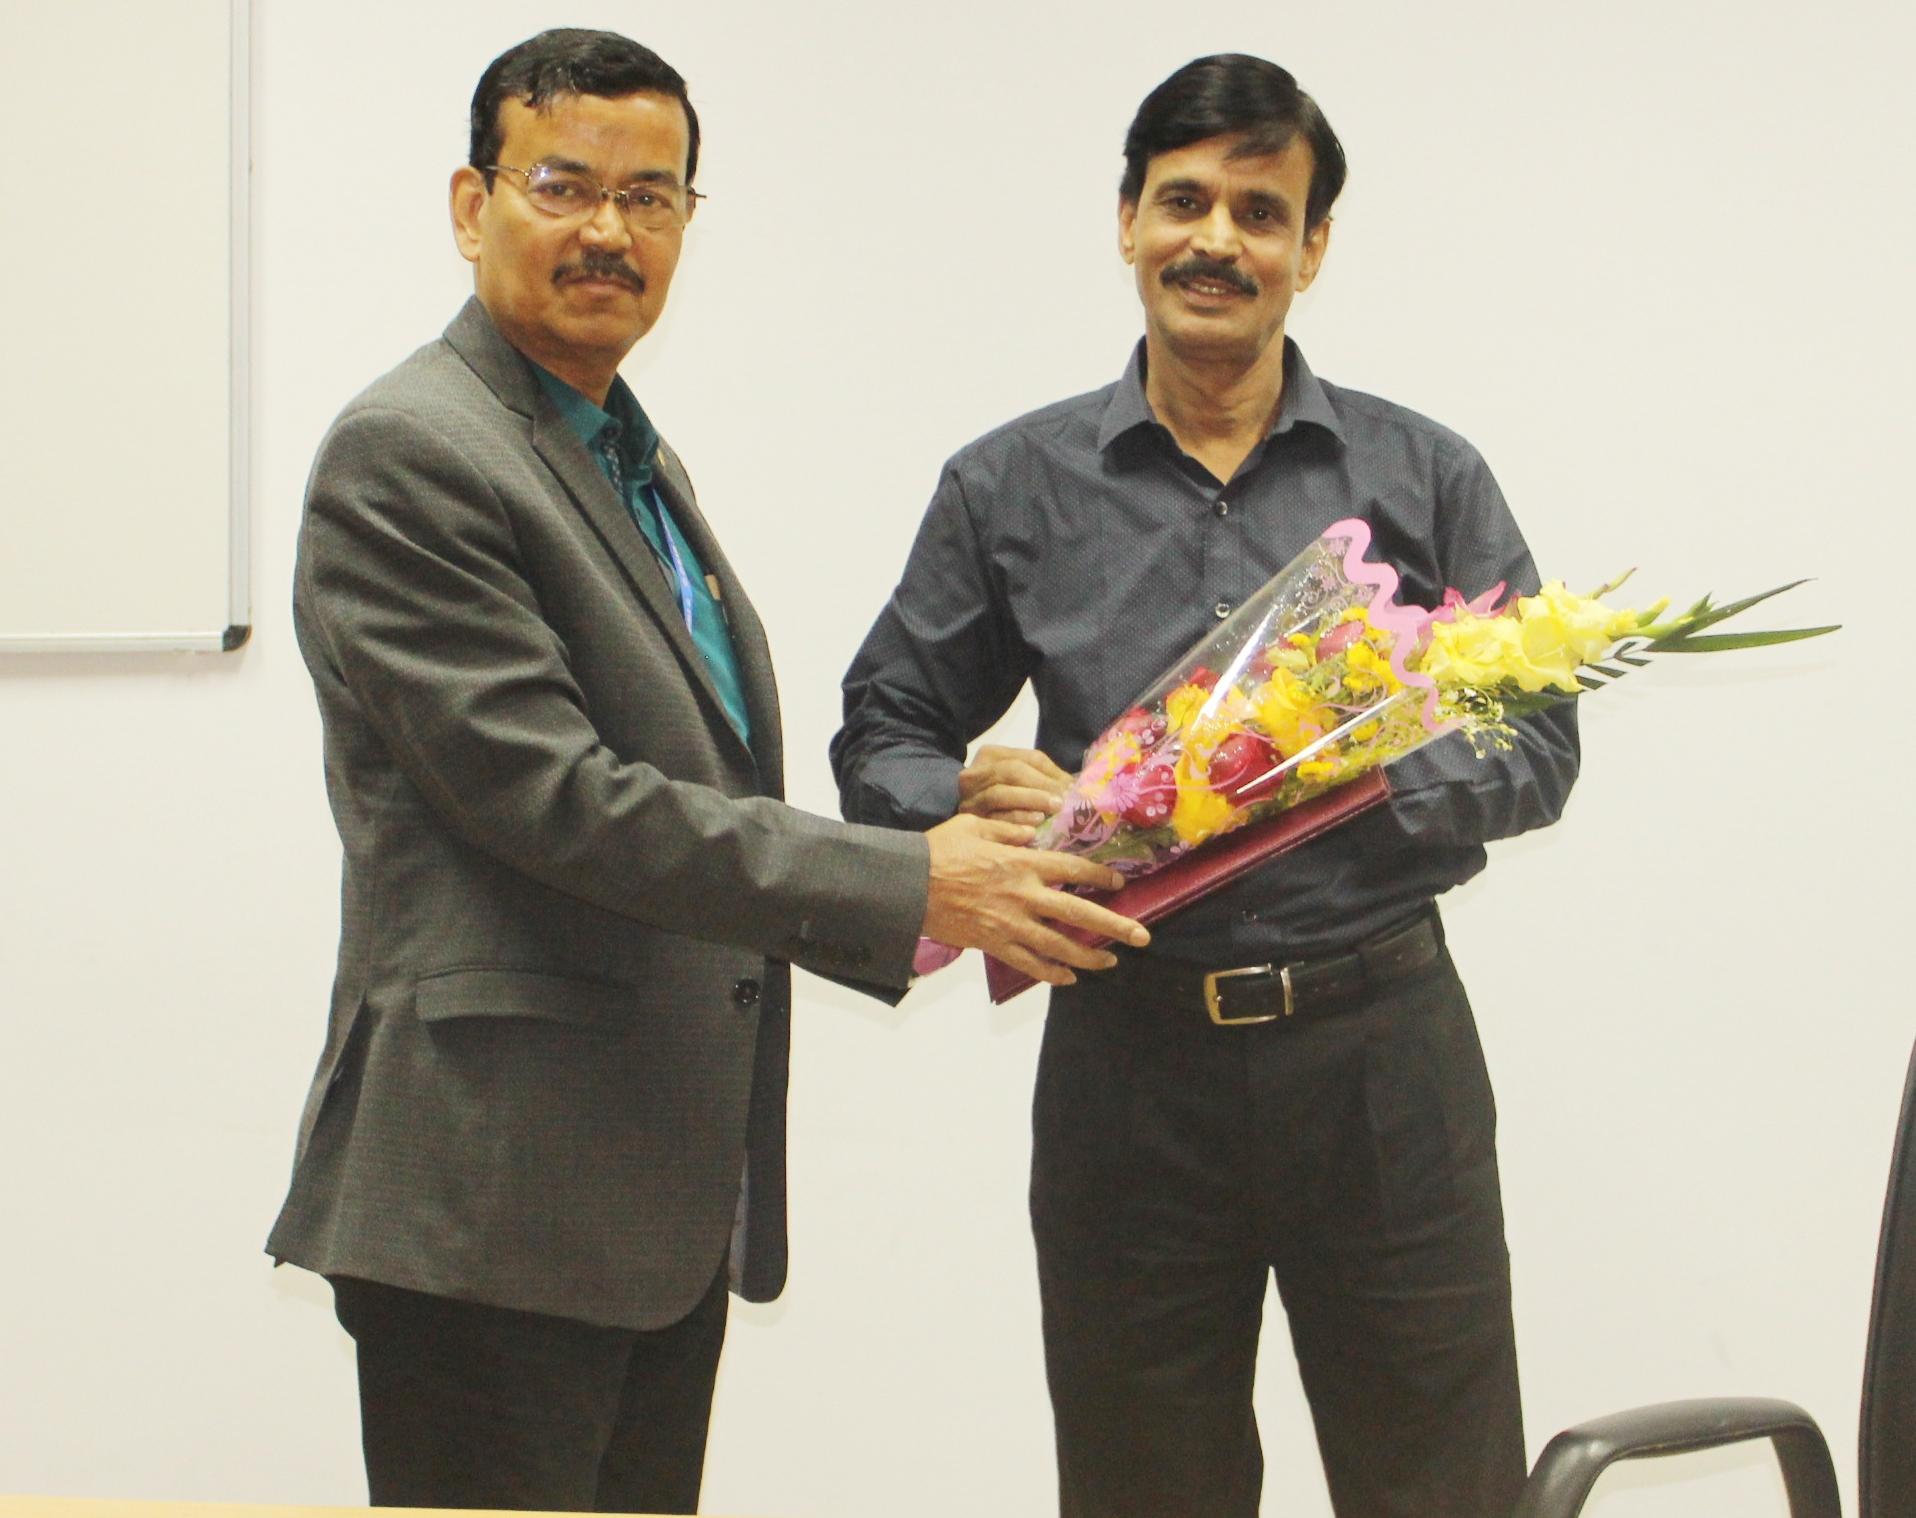 Superannuation of Shri Sukhendu Sekhar Mukhopadhyay, Principal Technical Officer from Council Service on 31.01.2020